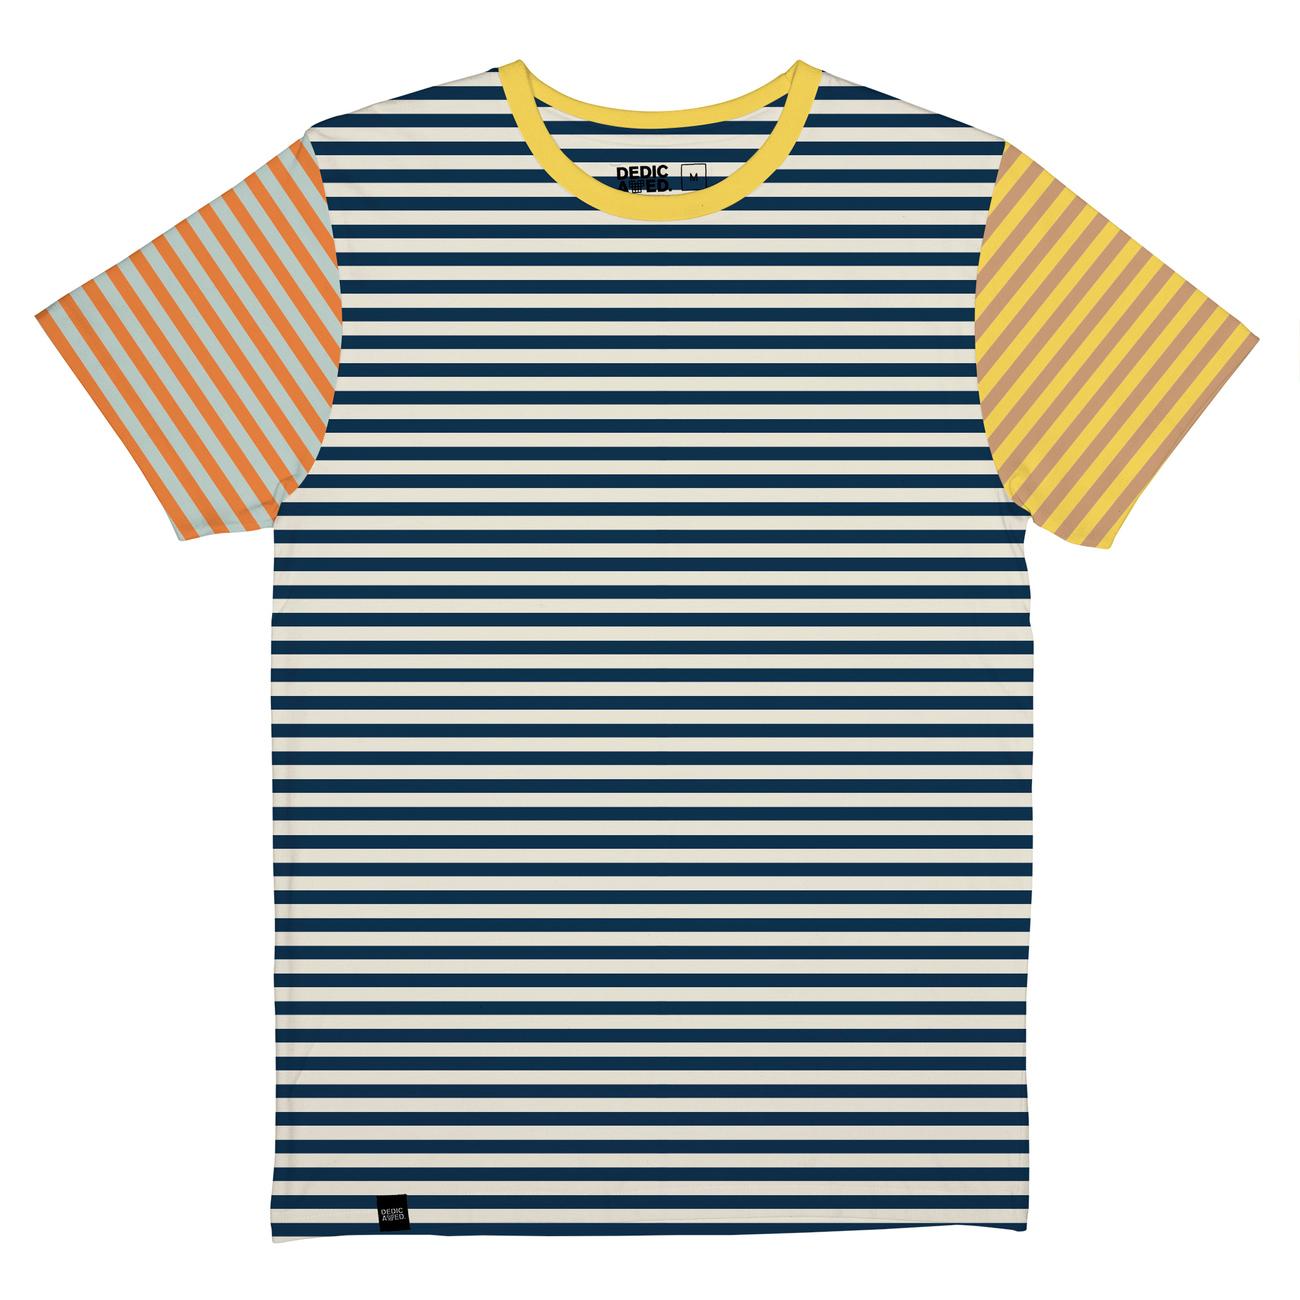 T-shirt Stockholm Block Stripes Multi Color